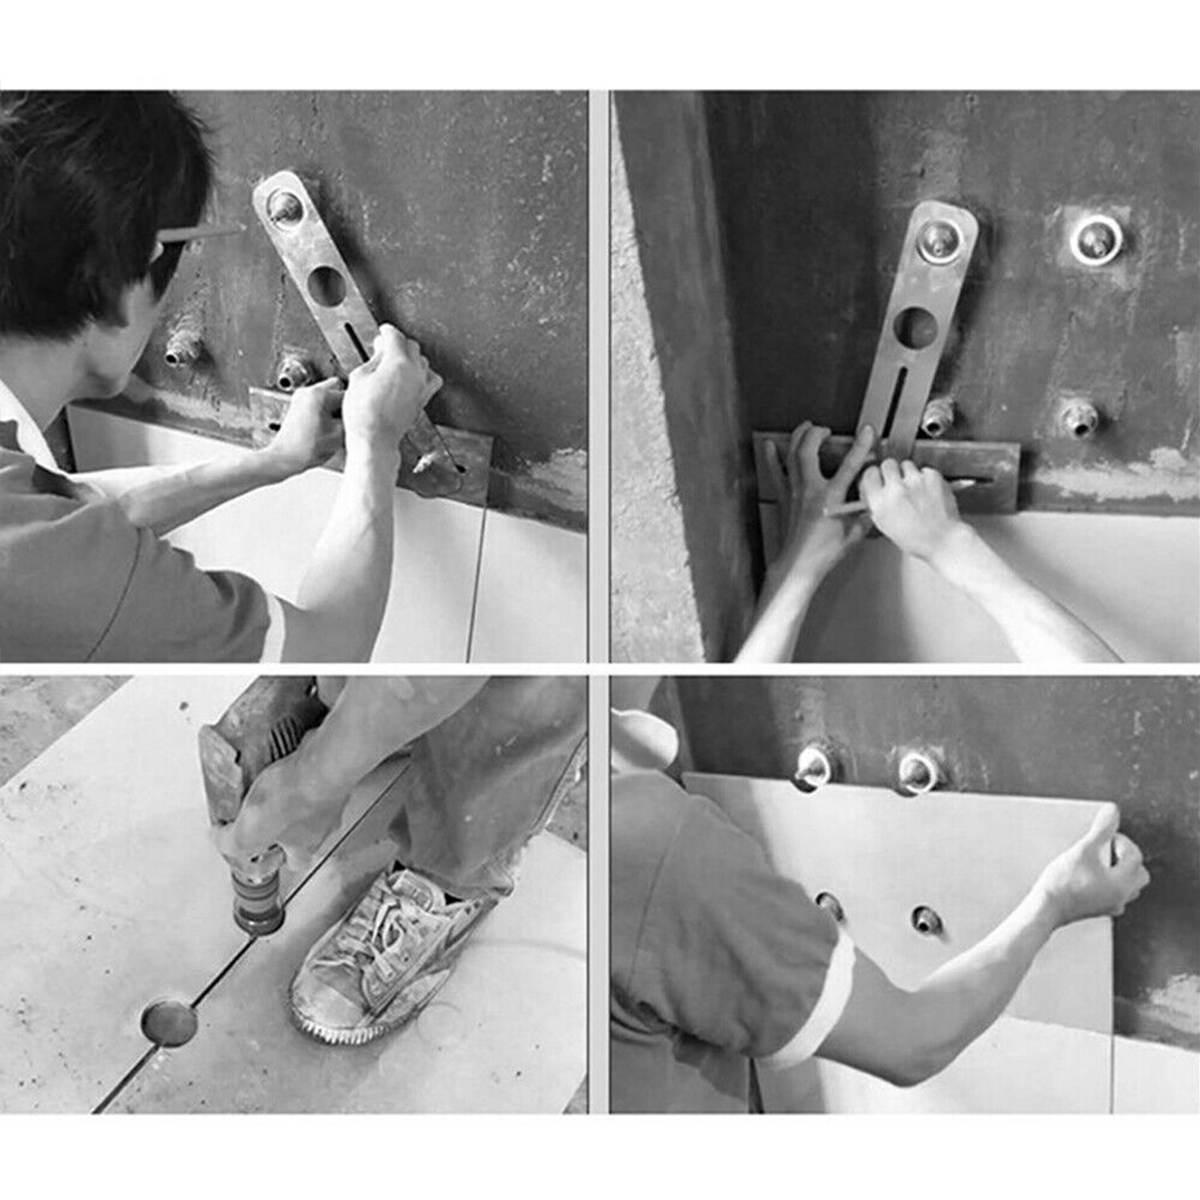 Купить с кэшбэком Multi-Functional Stainless Steel Ceramic Tile Hole Locator Ruler Adjustable Punching Hand Tool for House Decorated Work